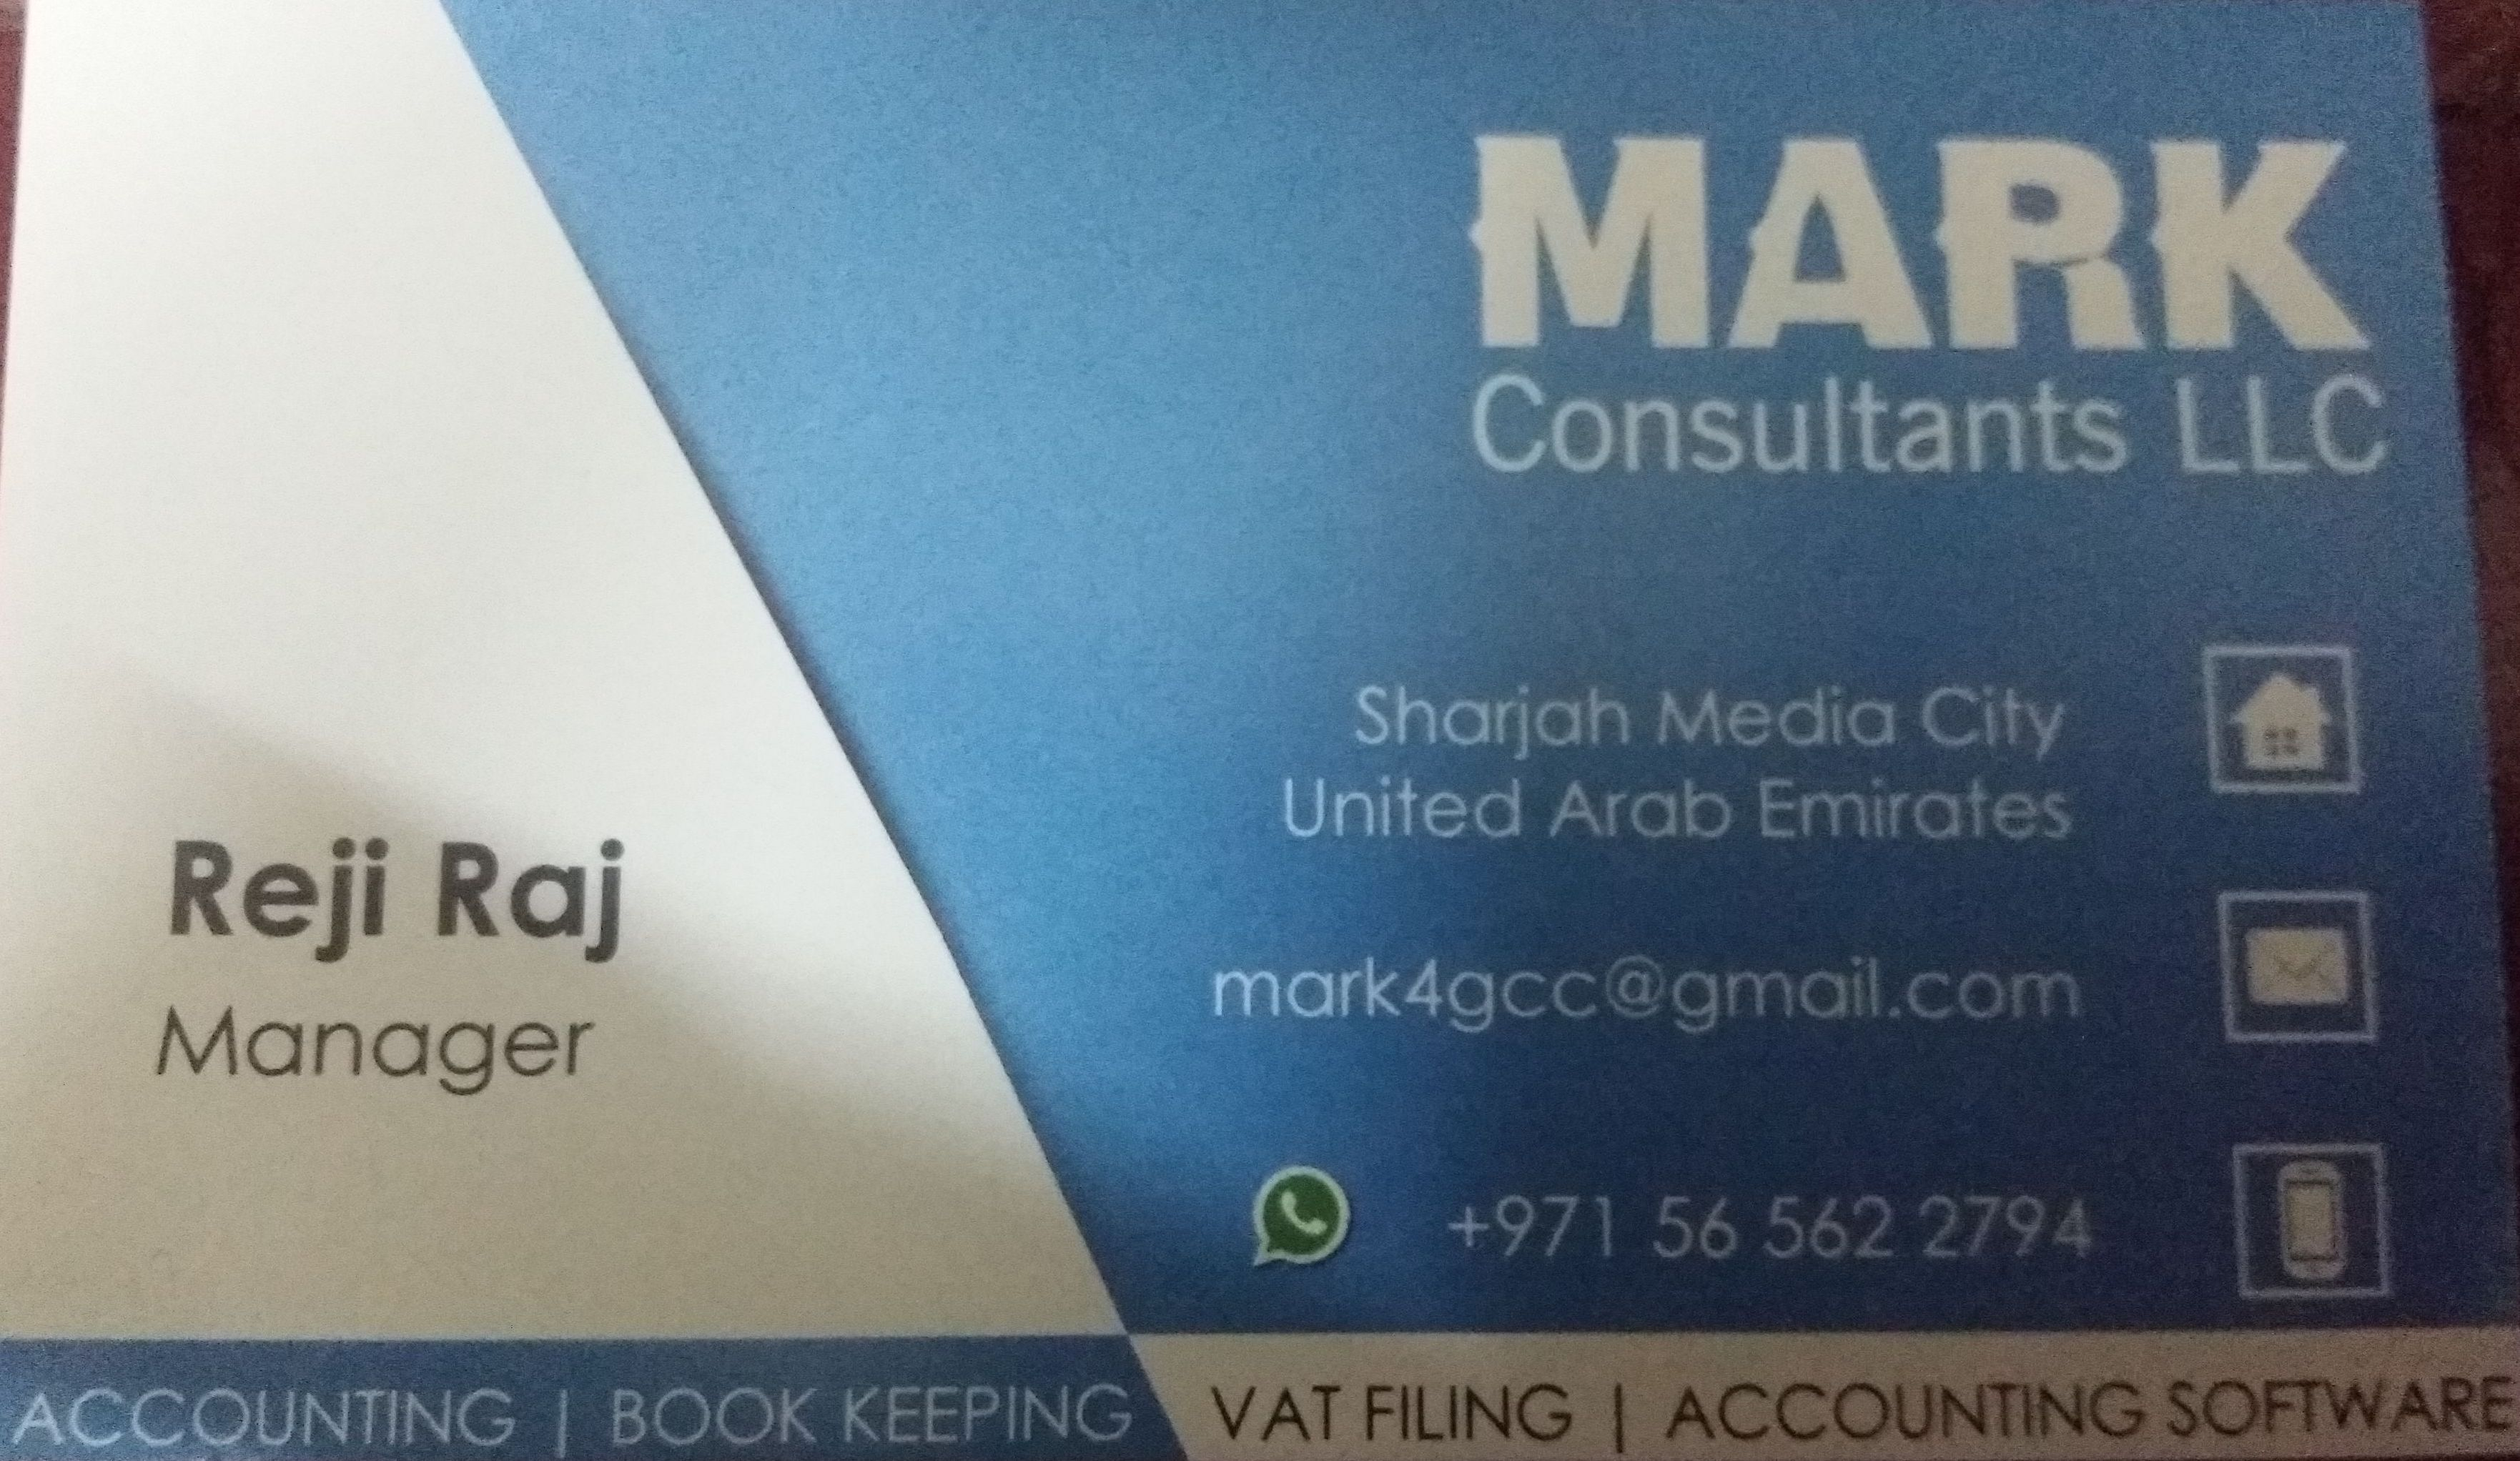 MARK Consultants LLC